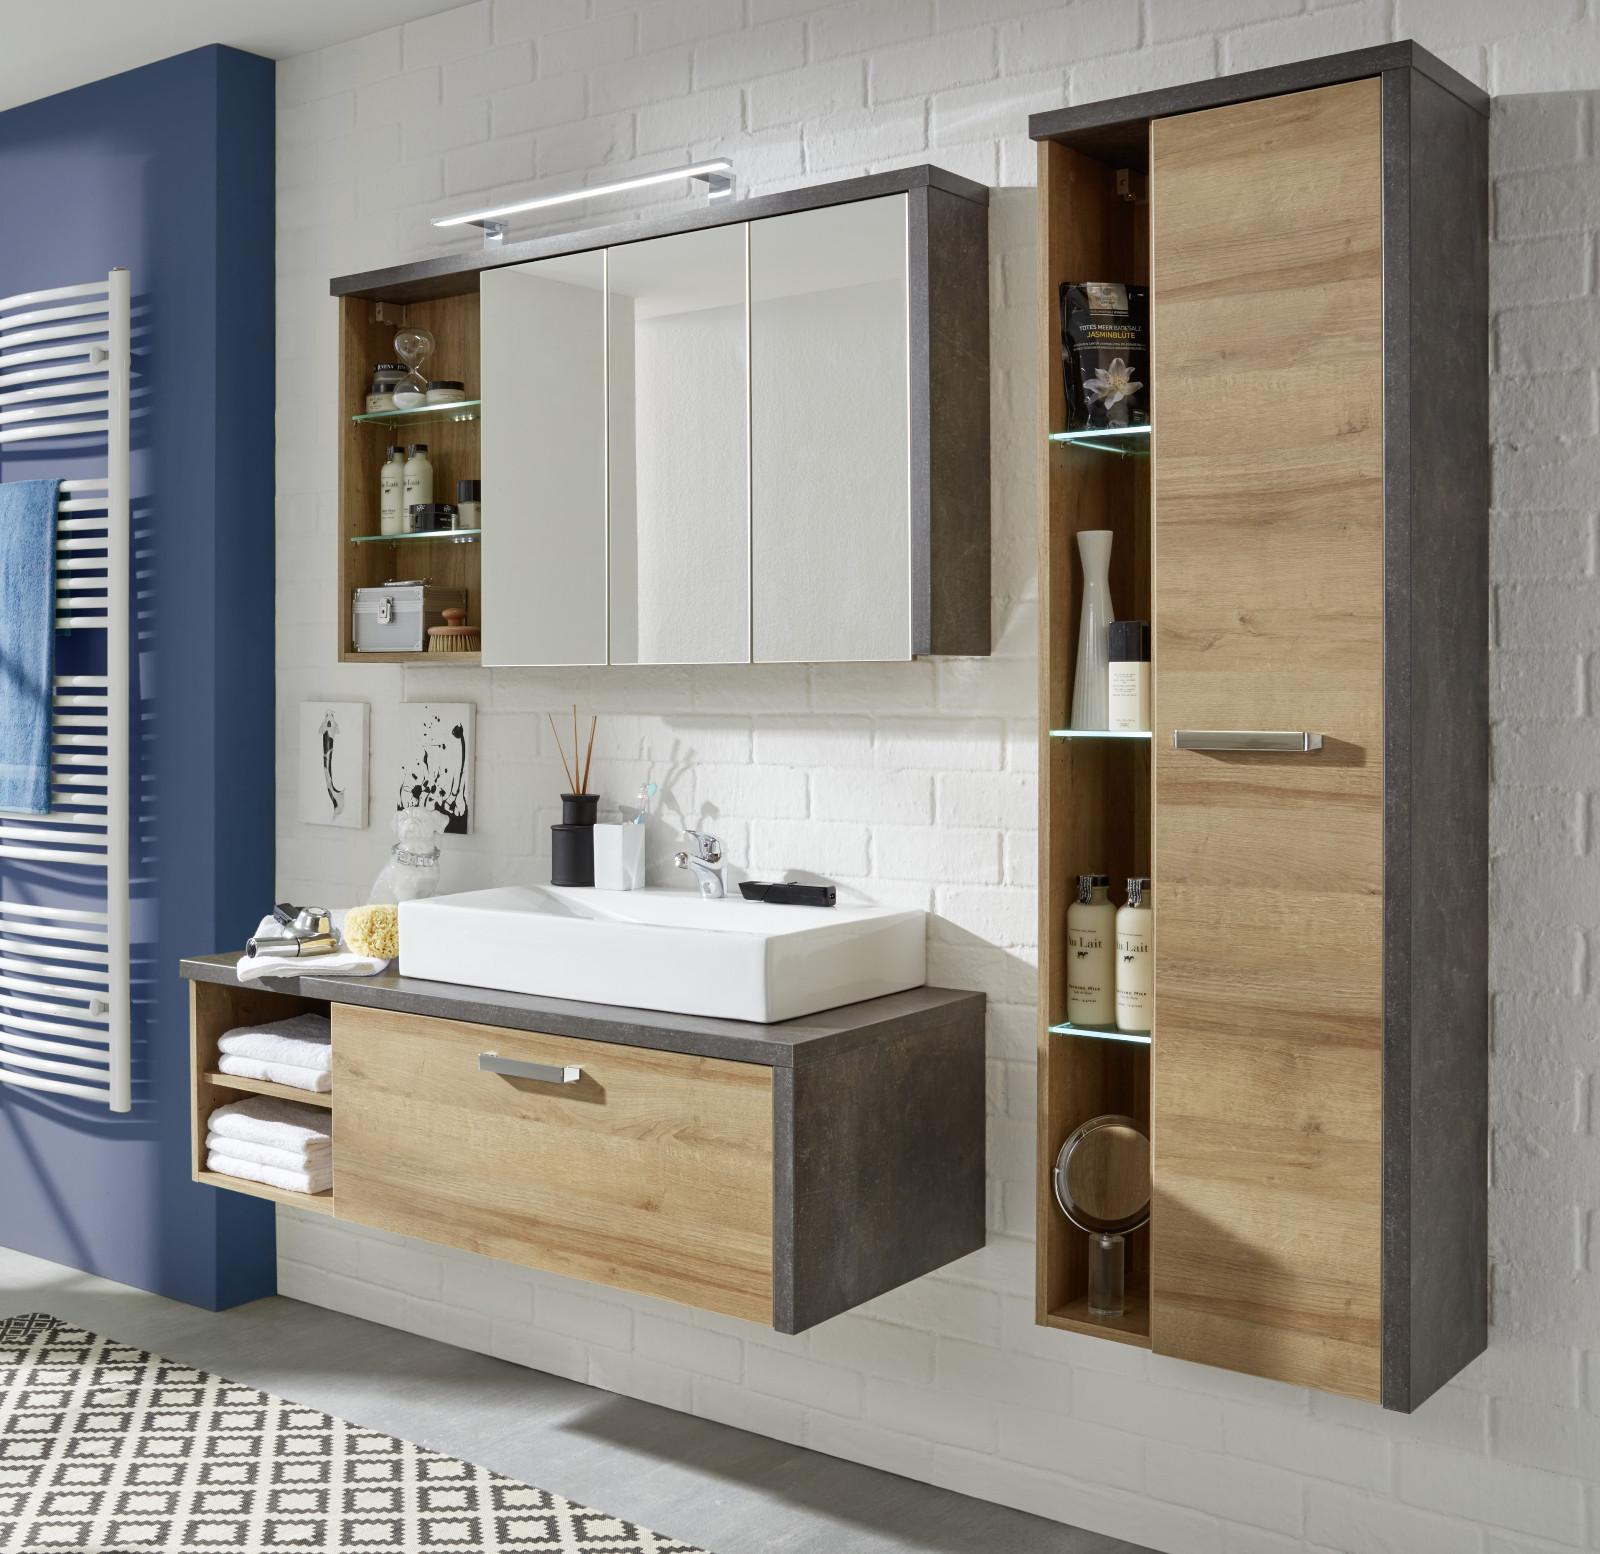 h nge hochschrank bay eiche honig grau beton. Black Bedroom Furniture Sets. Home Design Ideas